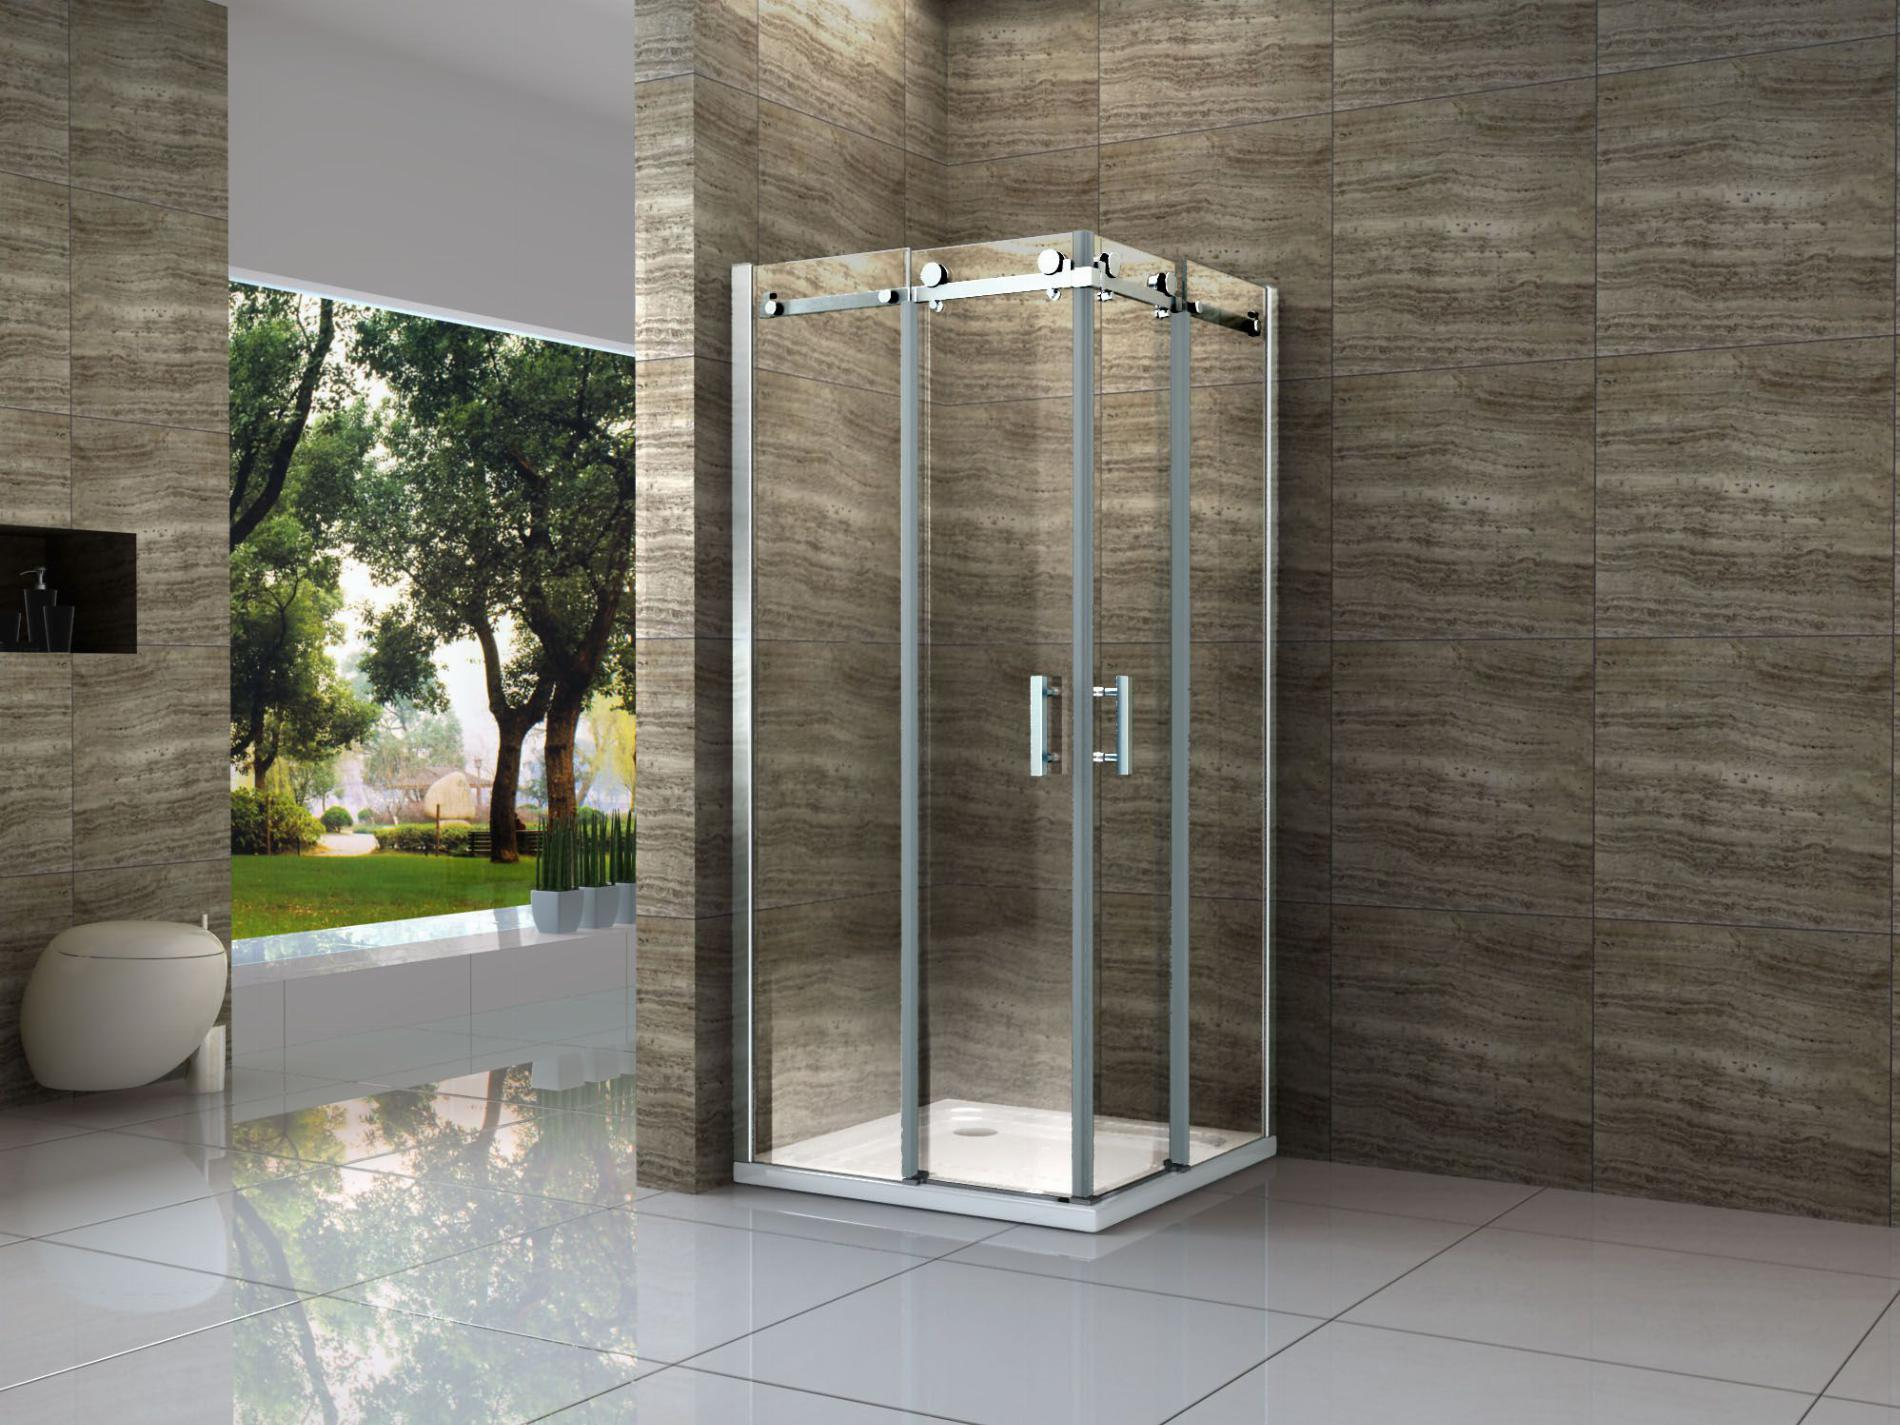 Duschkabine AREA 80 x 90 x 195 cm ohne Duschtasse